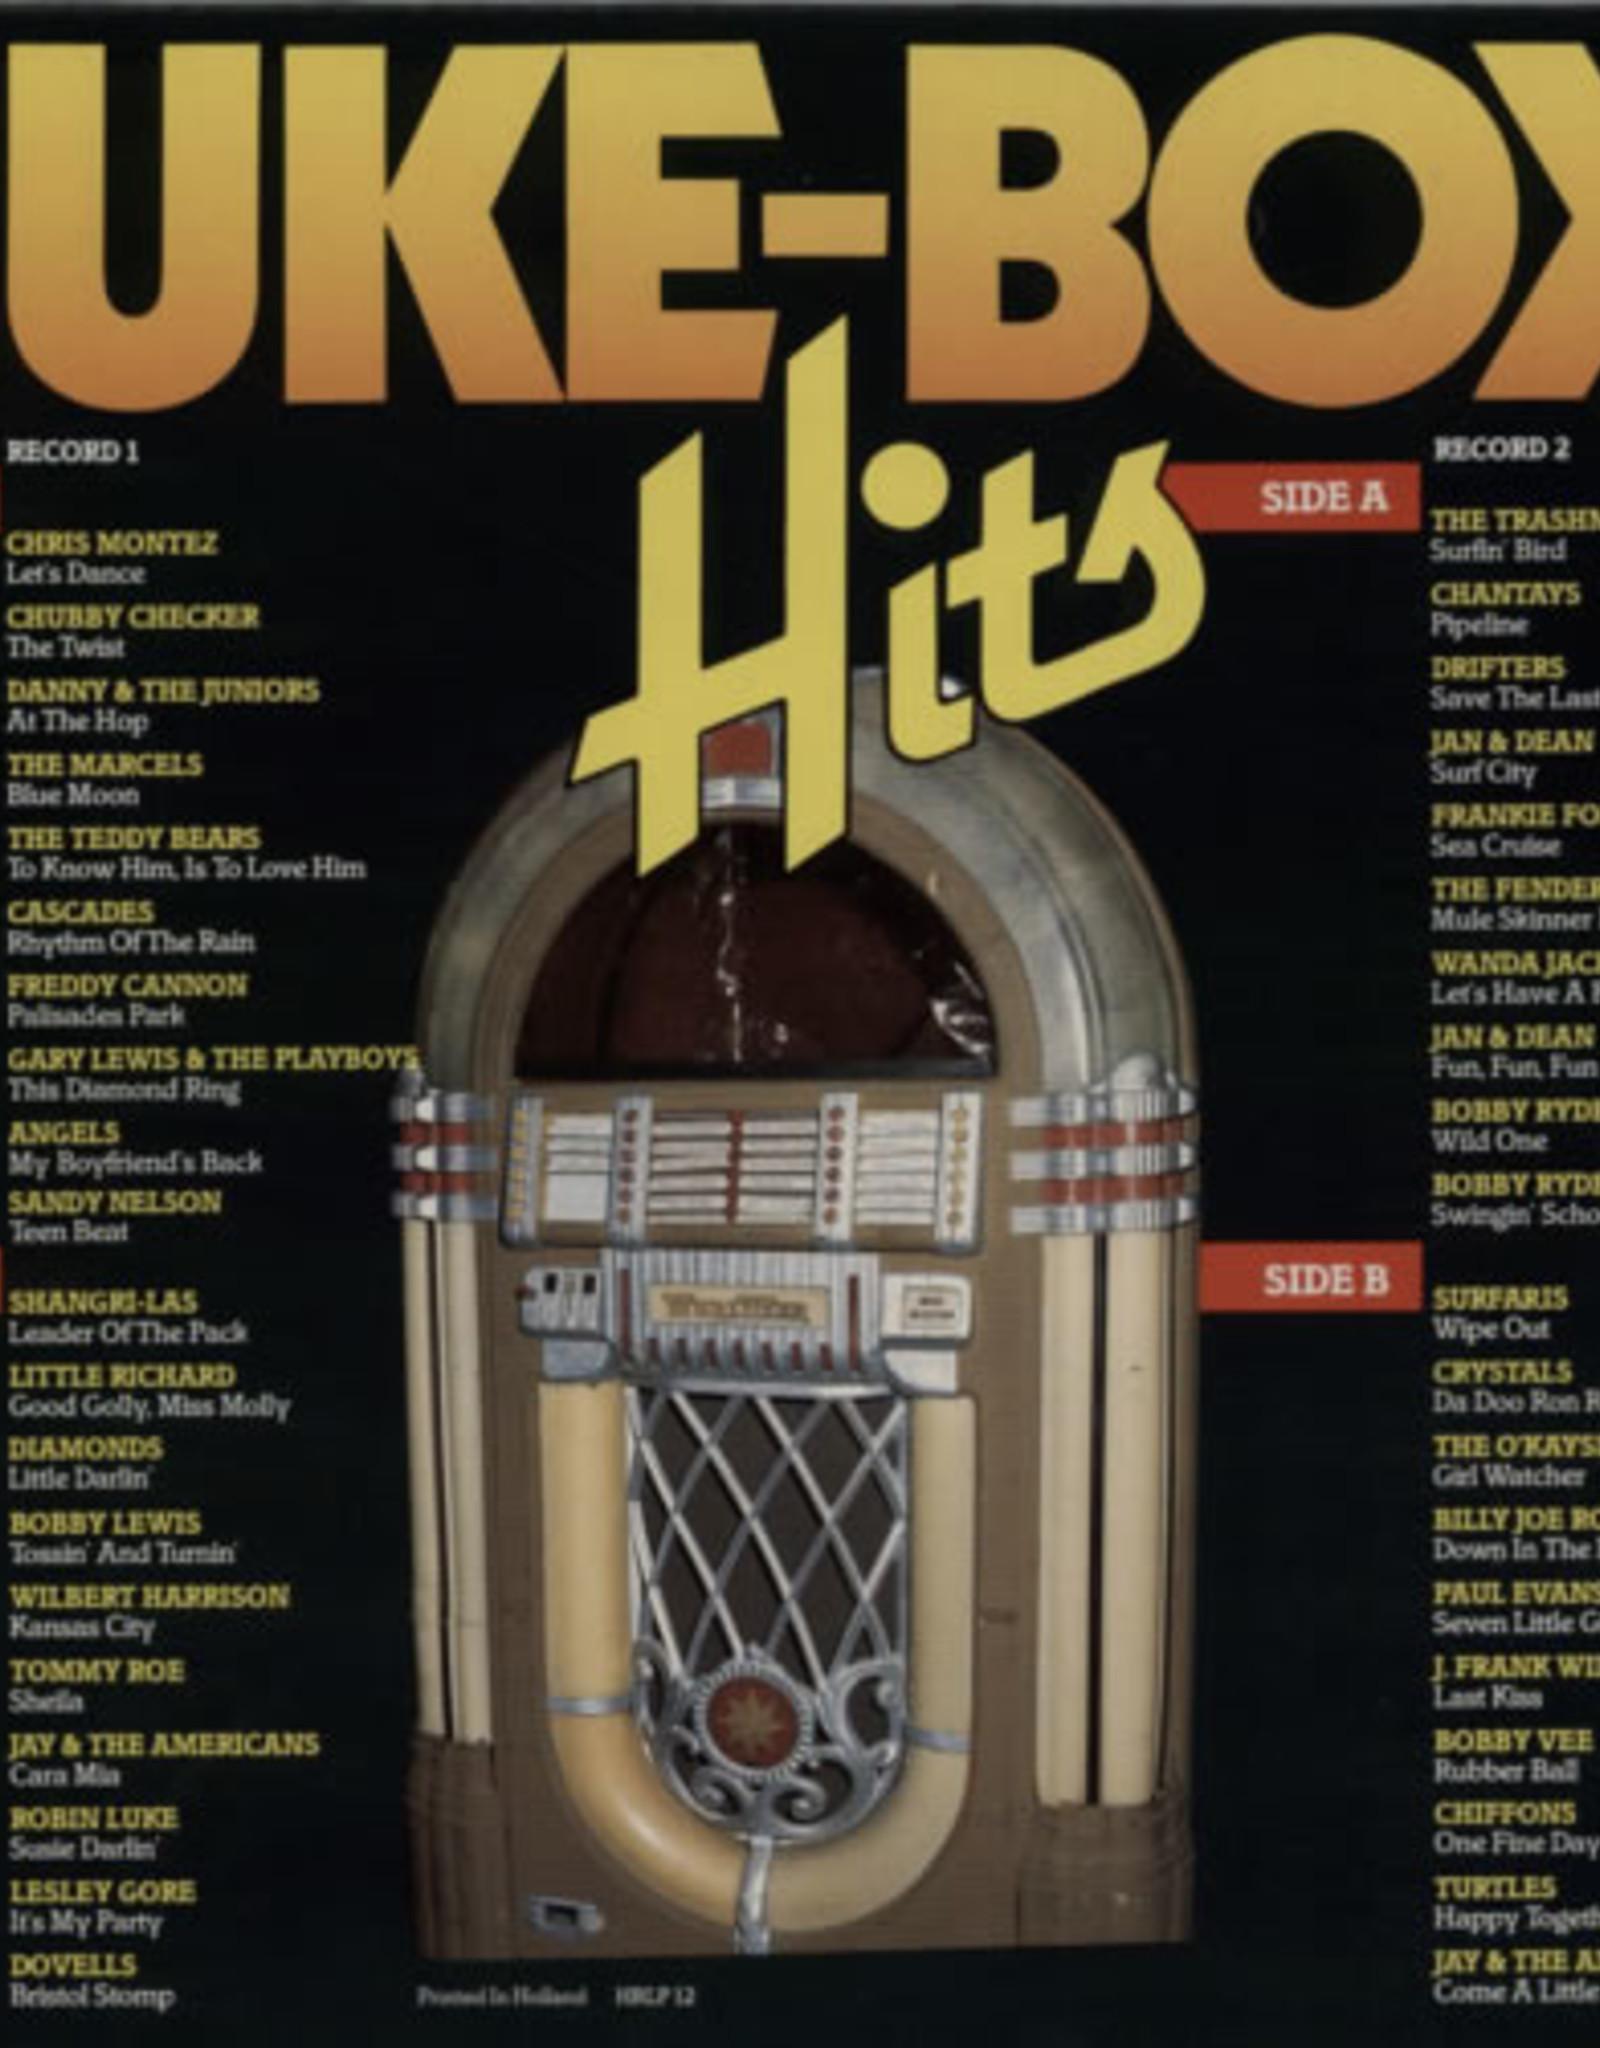 Jukebox Hits (2 Lp'S) - Wanda Jackson / Chubby Checker